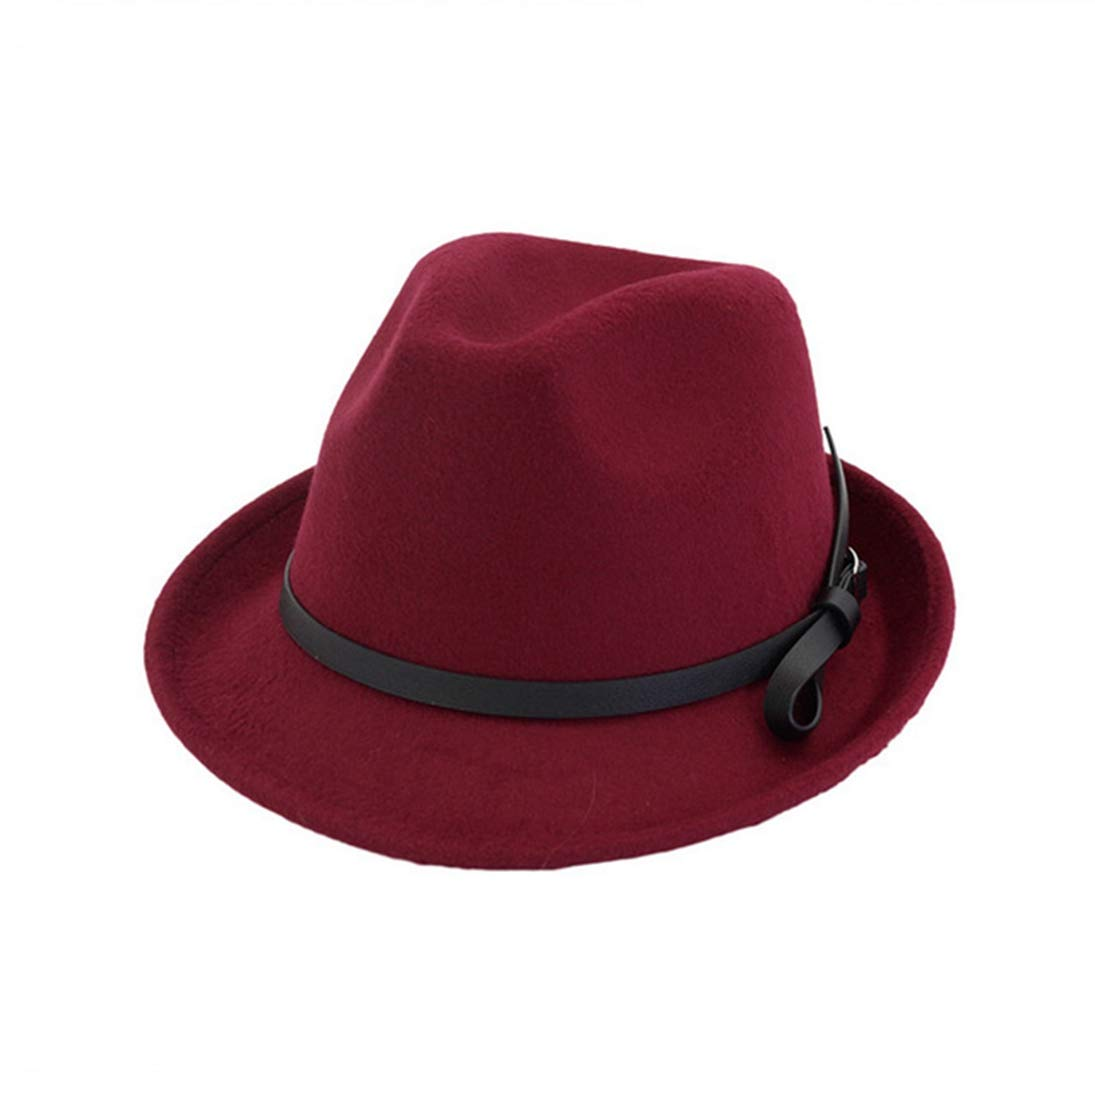 Wool Felt Fedora Hats for Men Women Unisex Classic Roll Narrow Brim Trilby Jazz Hat with Black Leather Belt Buckle